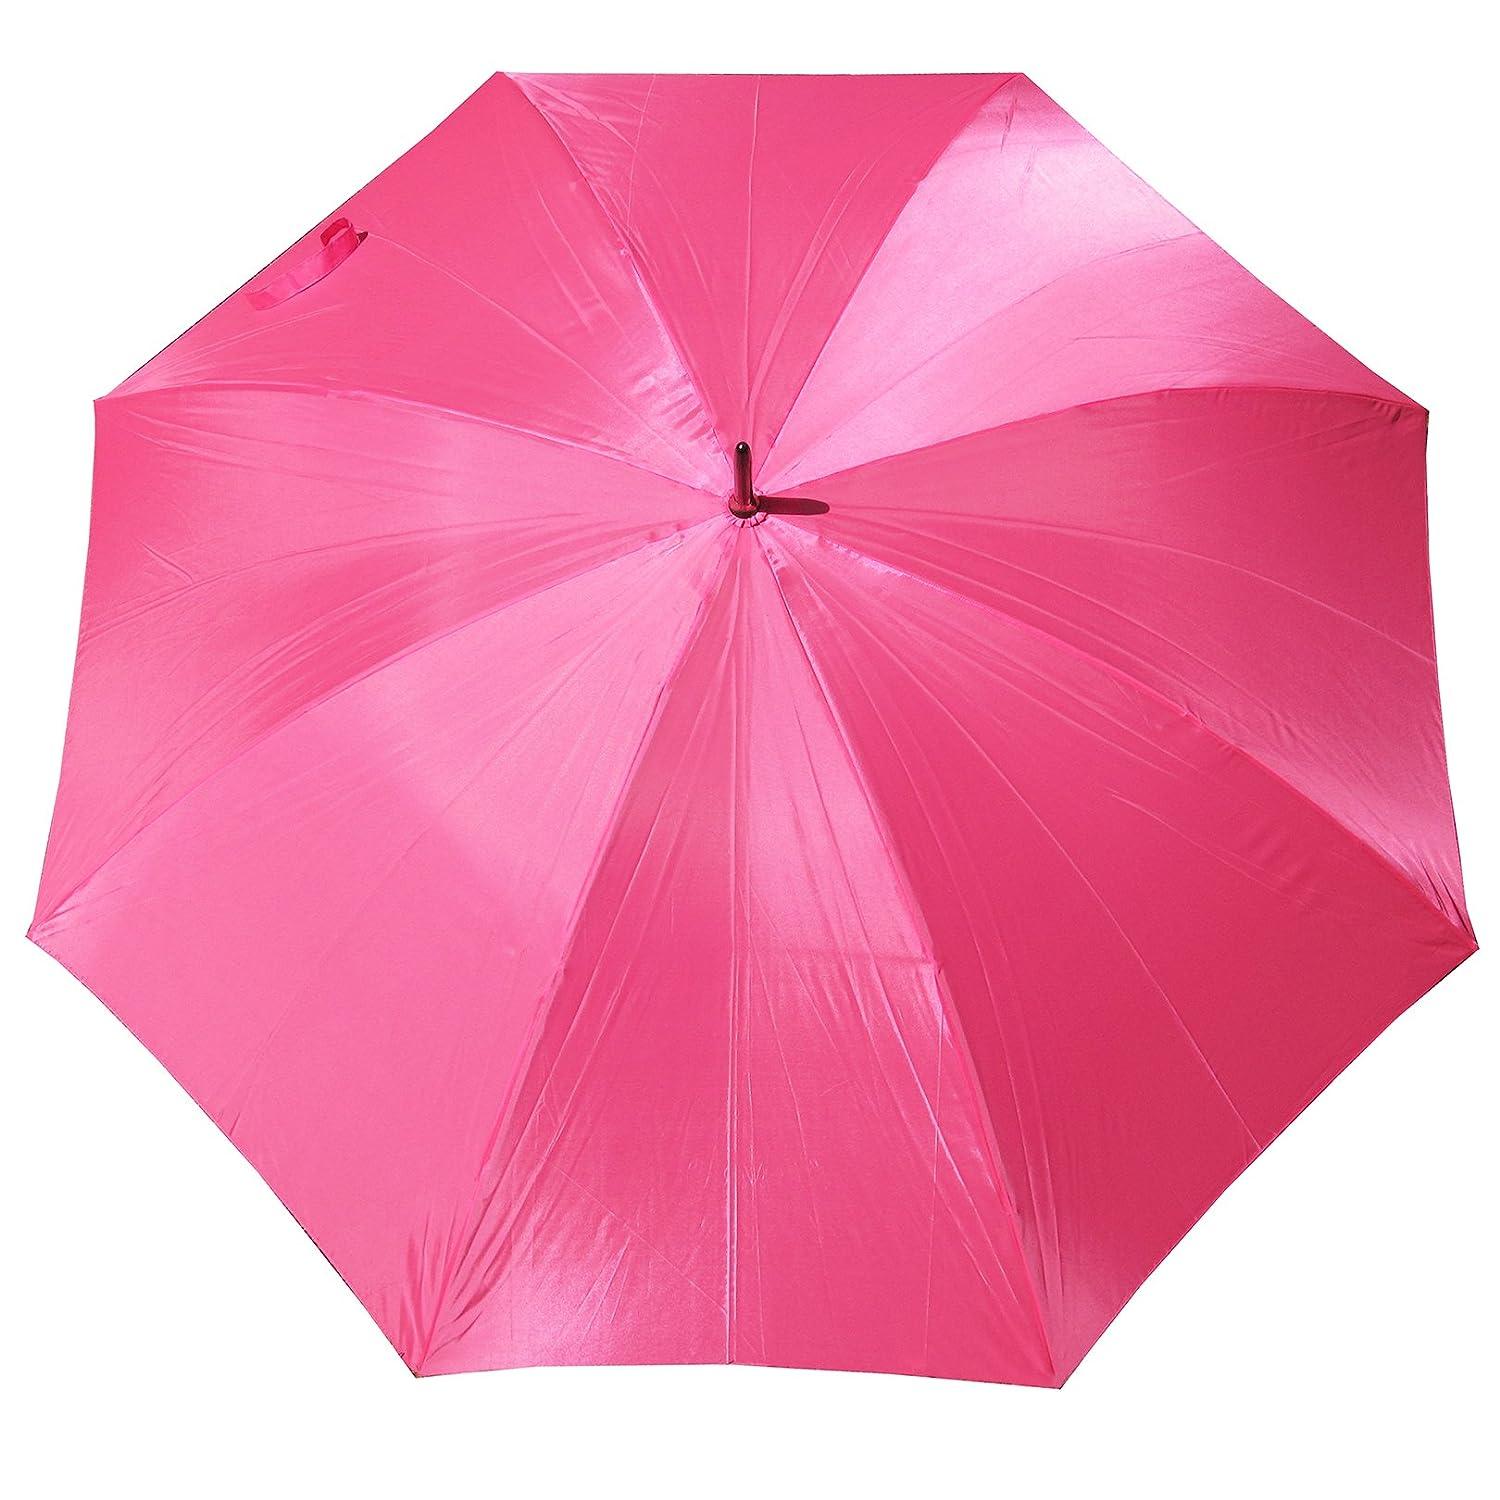 Amazon.com : HOT Pink 60 inch golf umbrella. HOT Pink Wedding ...